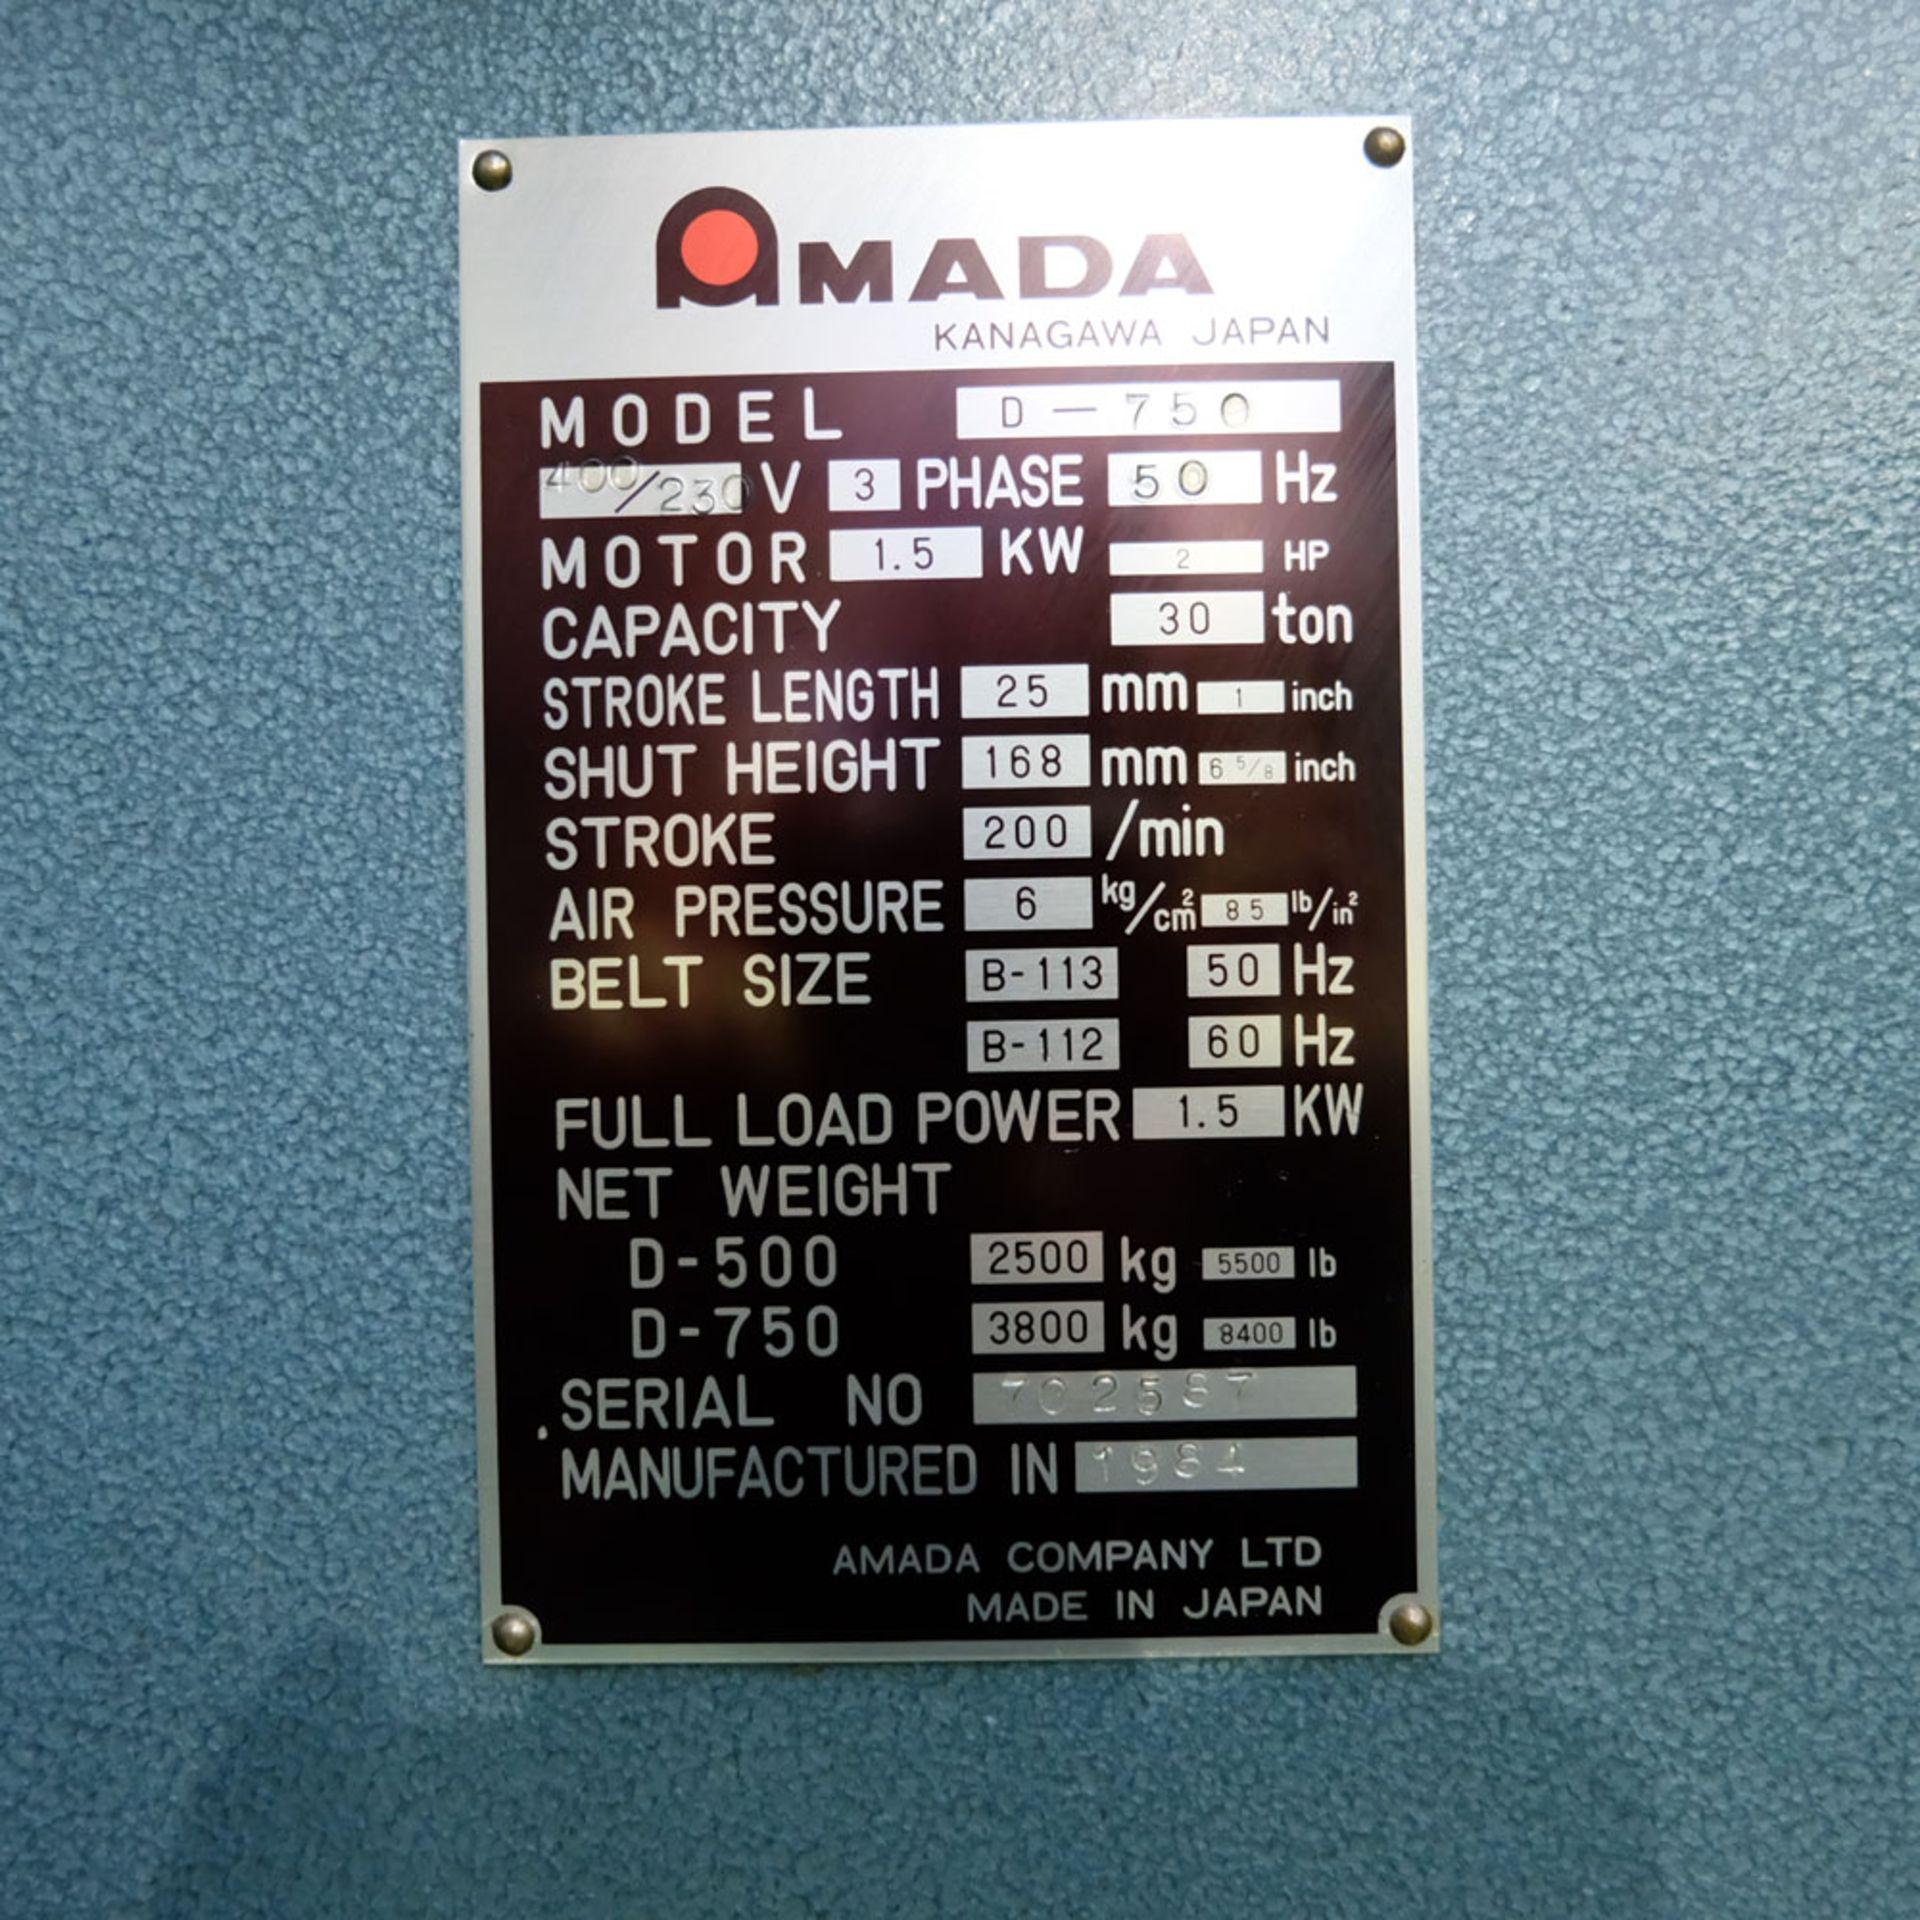 Amada D-750 Duplicator Punching Machine. - Image 13 of 18